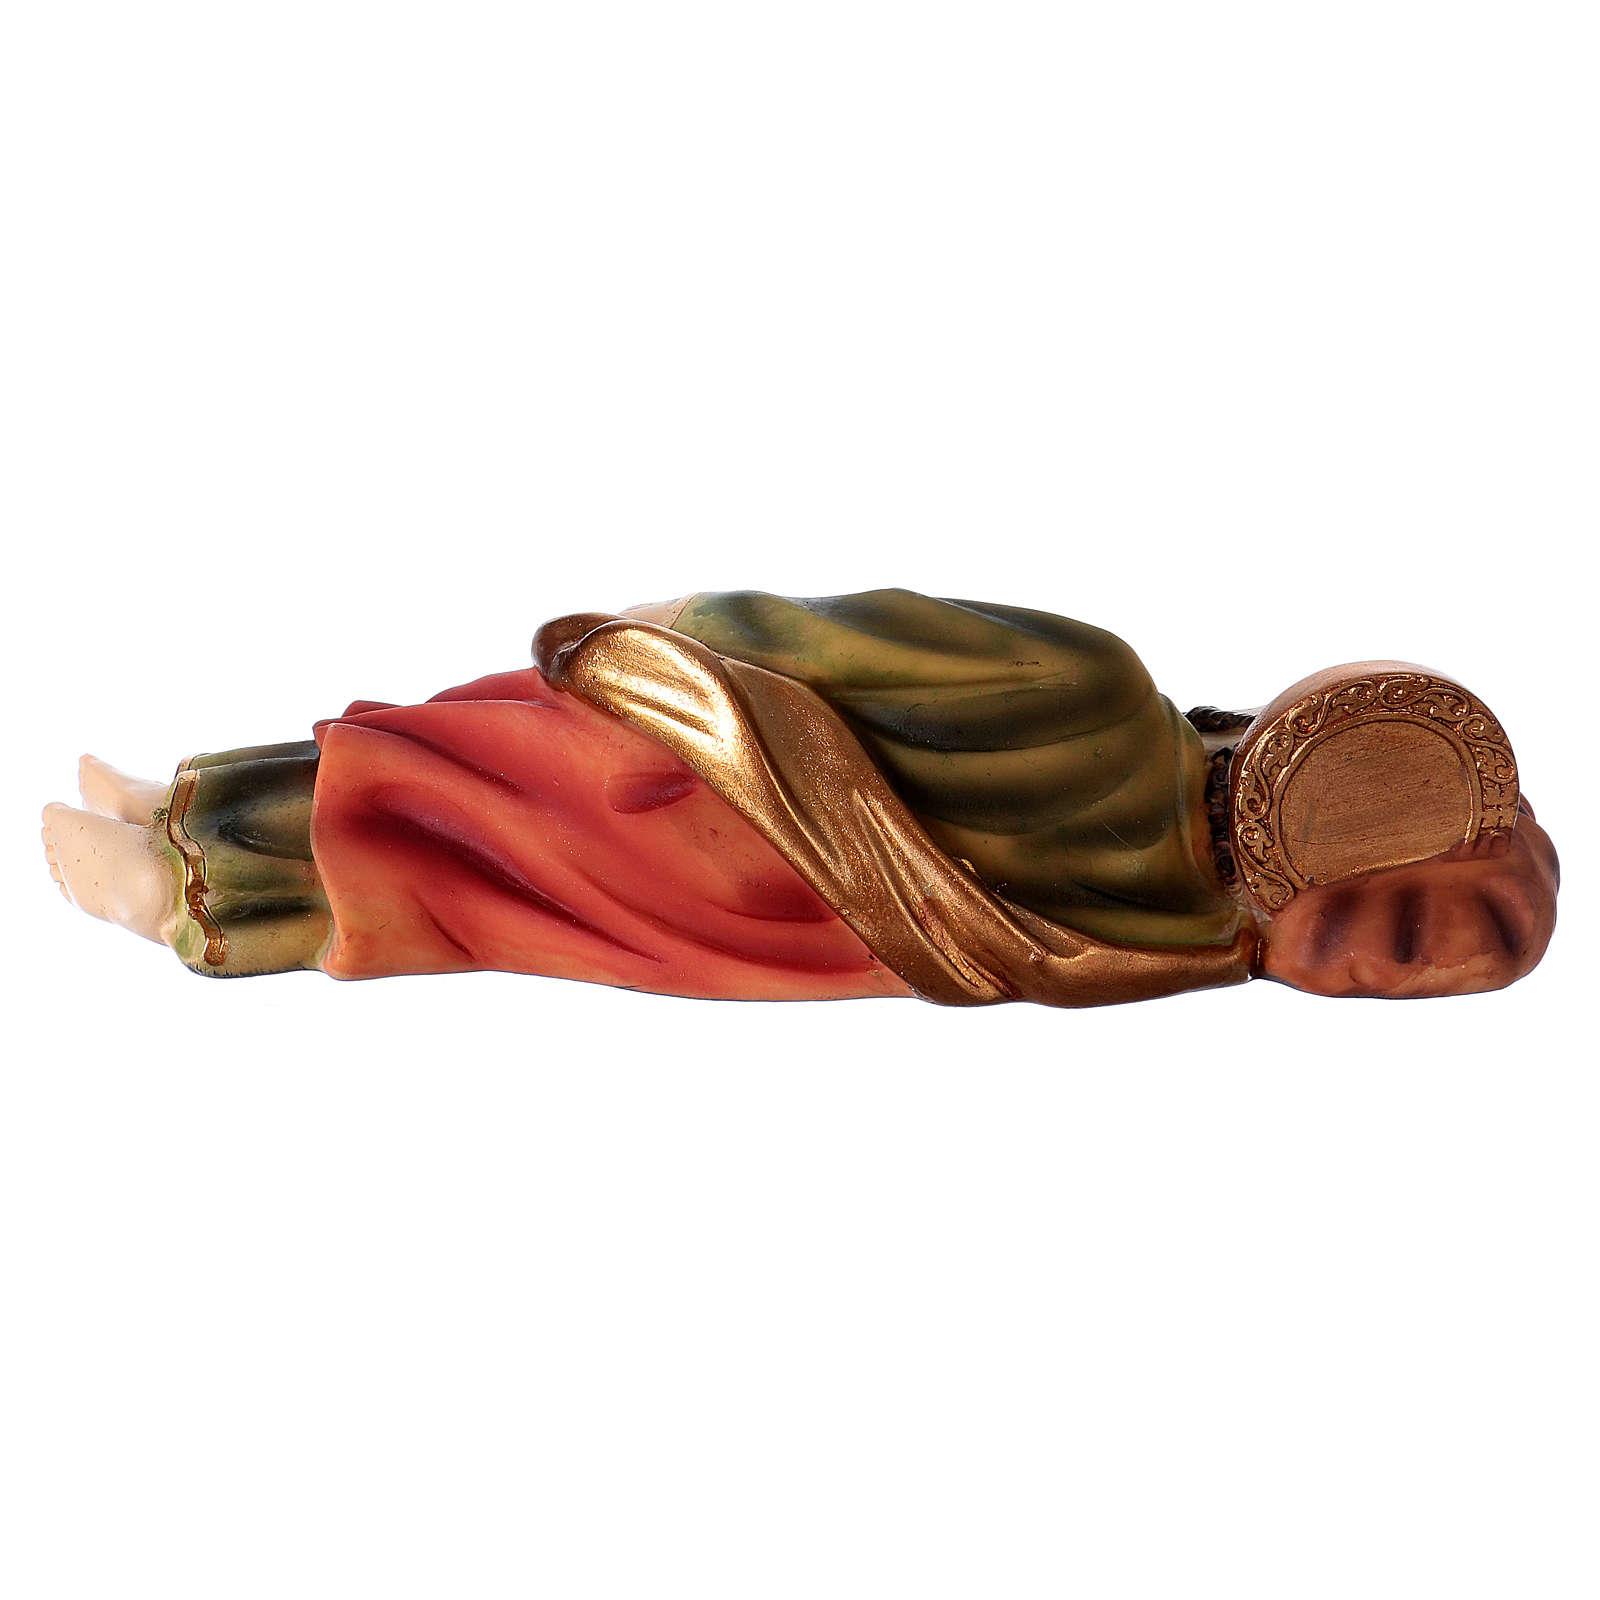 Sleeping Saint Joseph Resin Statue, 20 cm 3